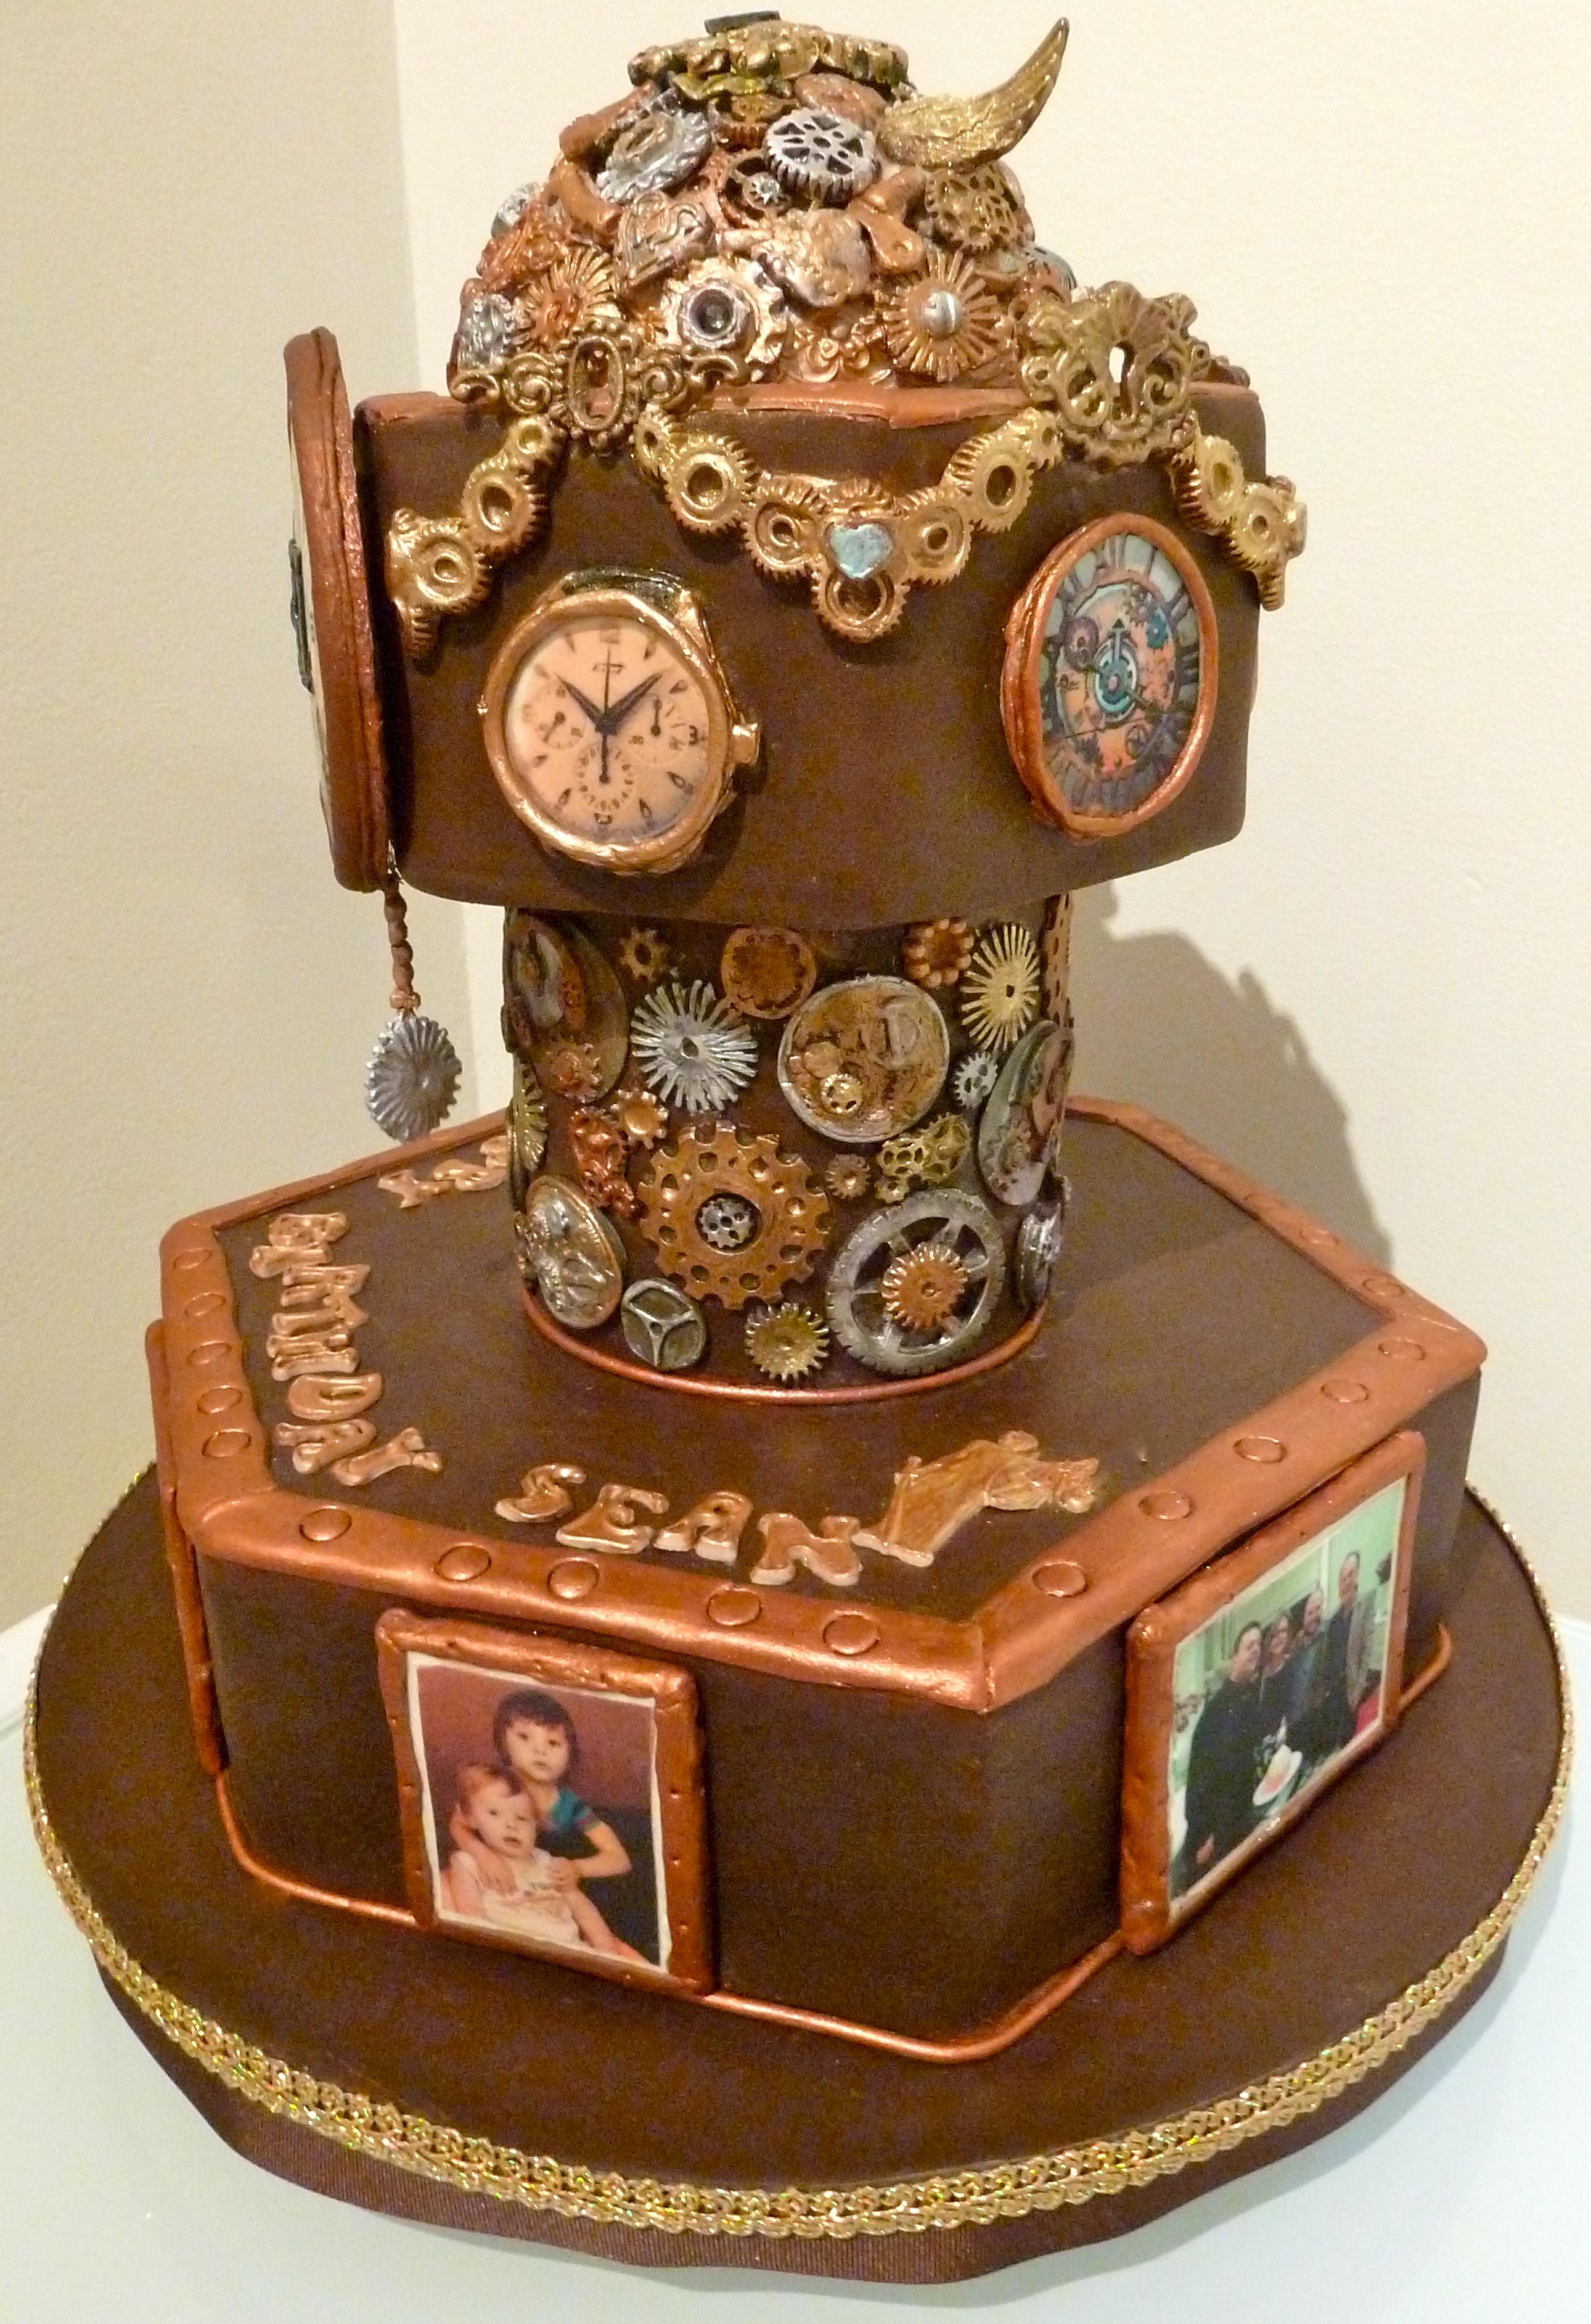 Cake Decorating Steampunk